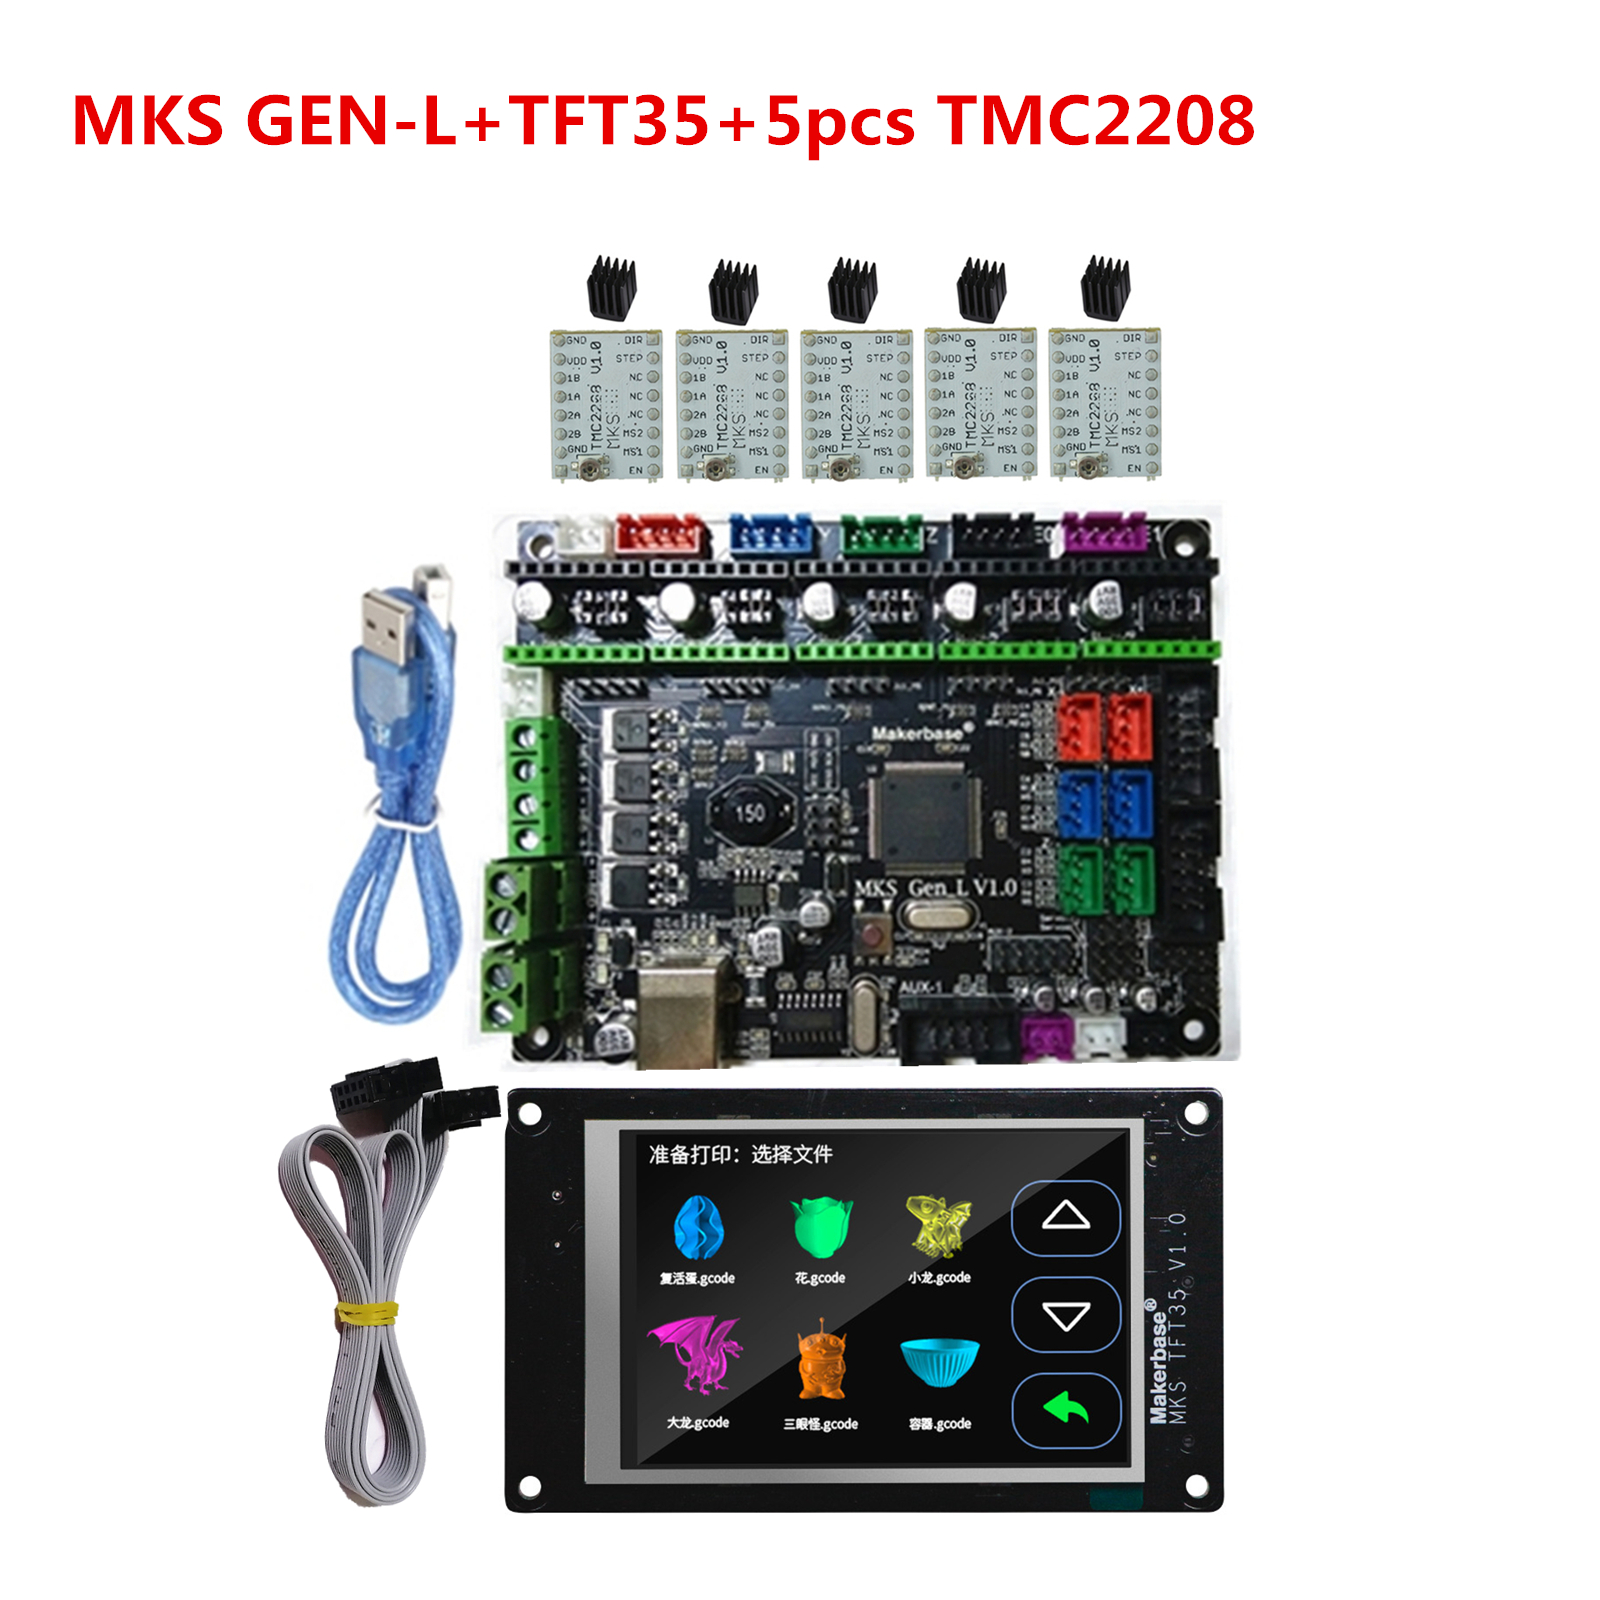 MKS GEN L 2.0 + MKS TFT3.5 Touch Screen 3D Printer Spare Parts Support A4988 DRV8825 Tmc2208 Lv8729 Tmc2130 2100 Stepper Driver